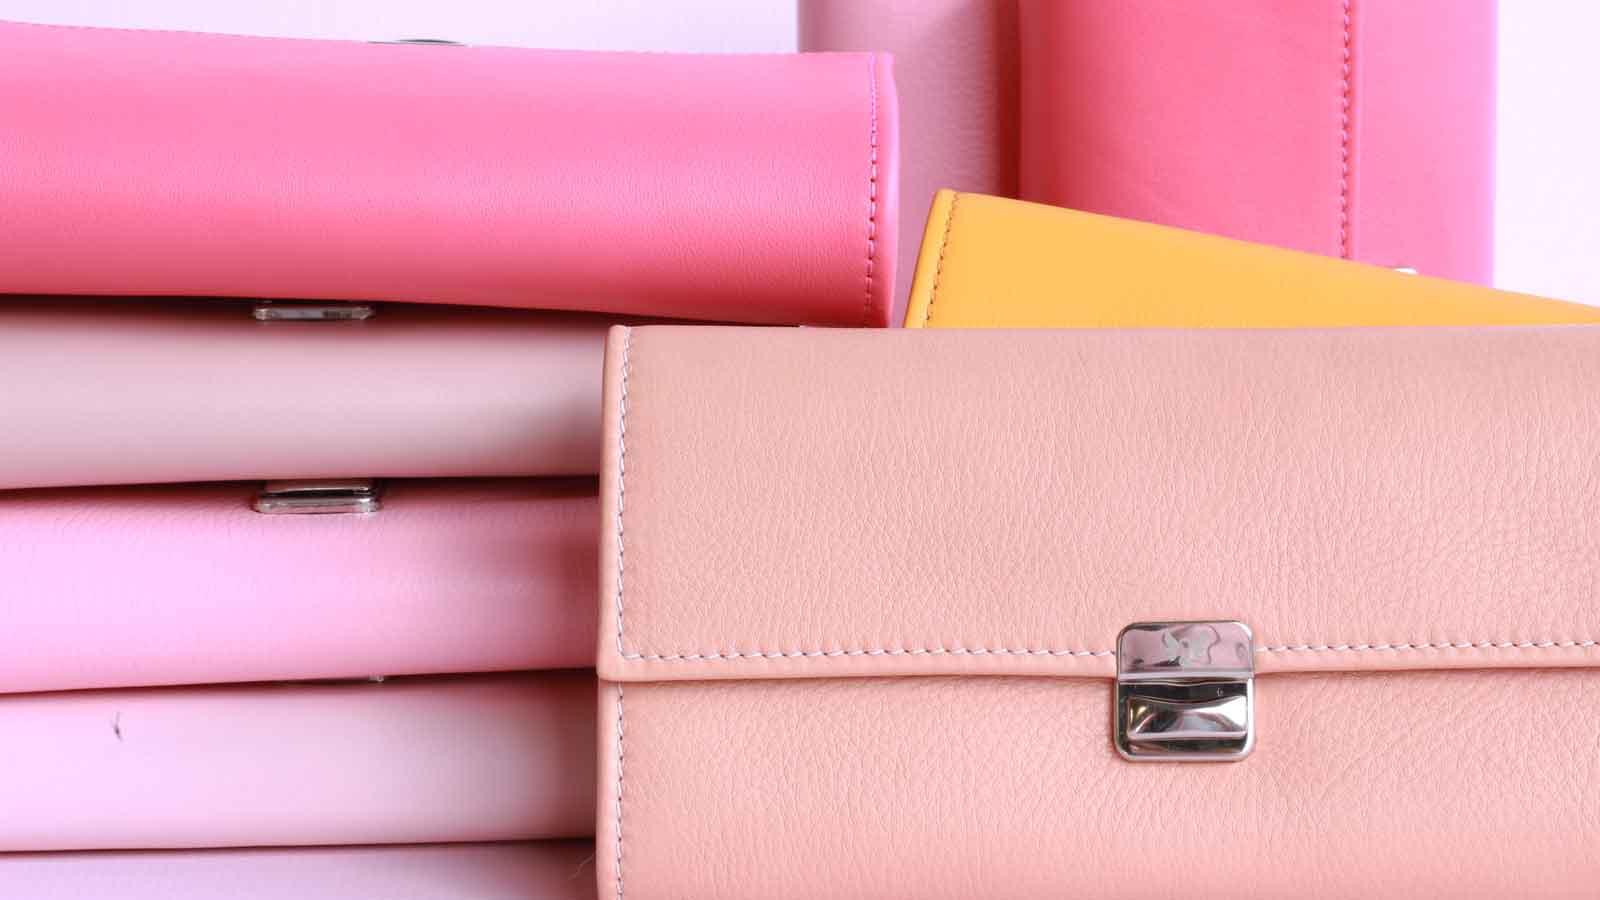 rosa leder portemonnaies kaufen elfenkalng